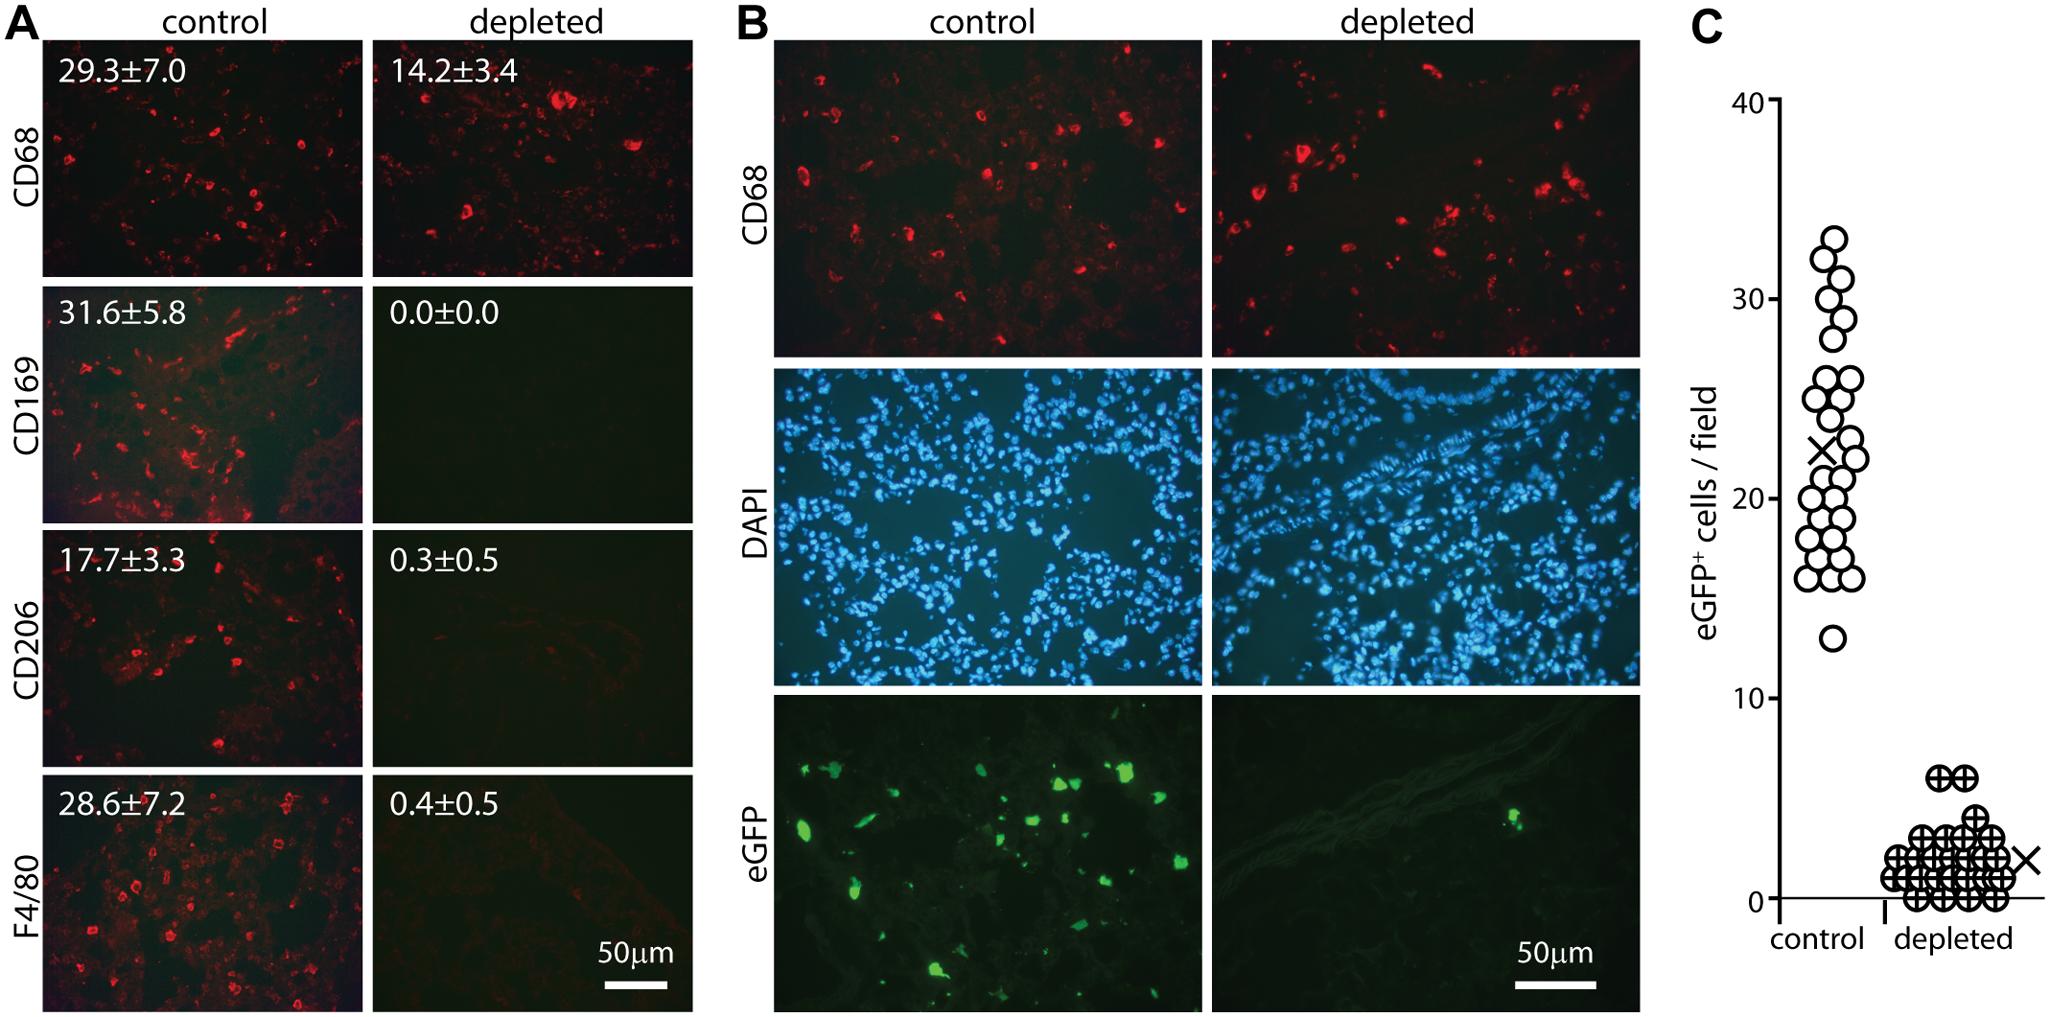 Effect of macrophage depletion on host entry.